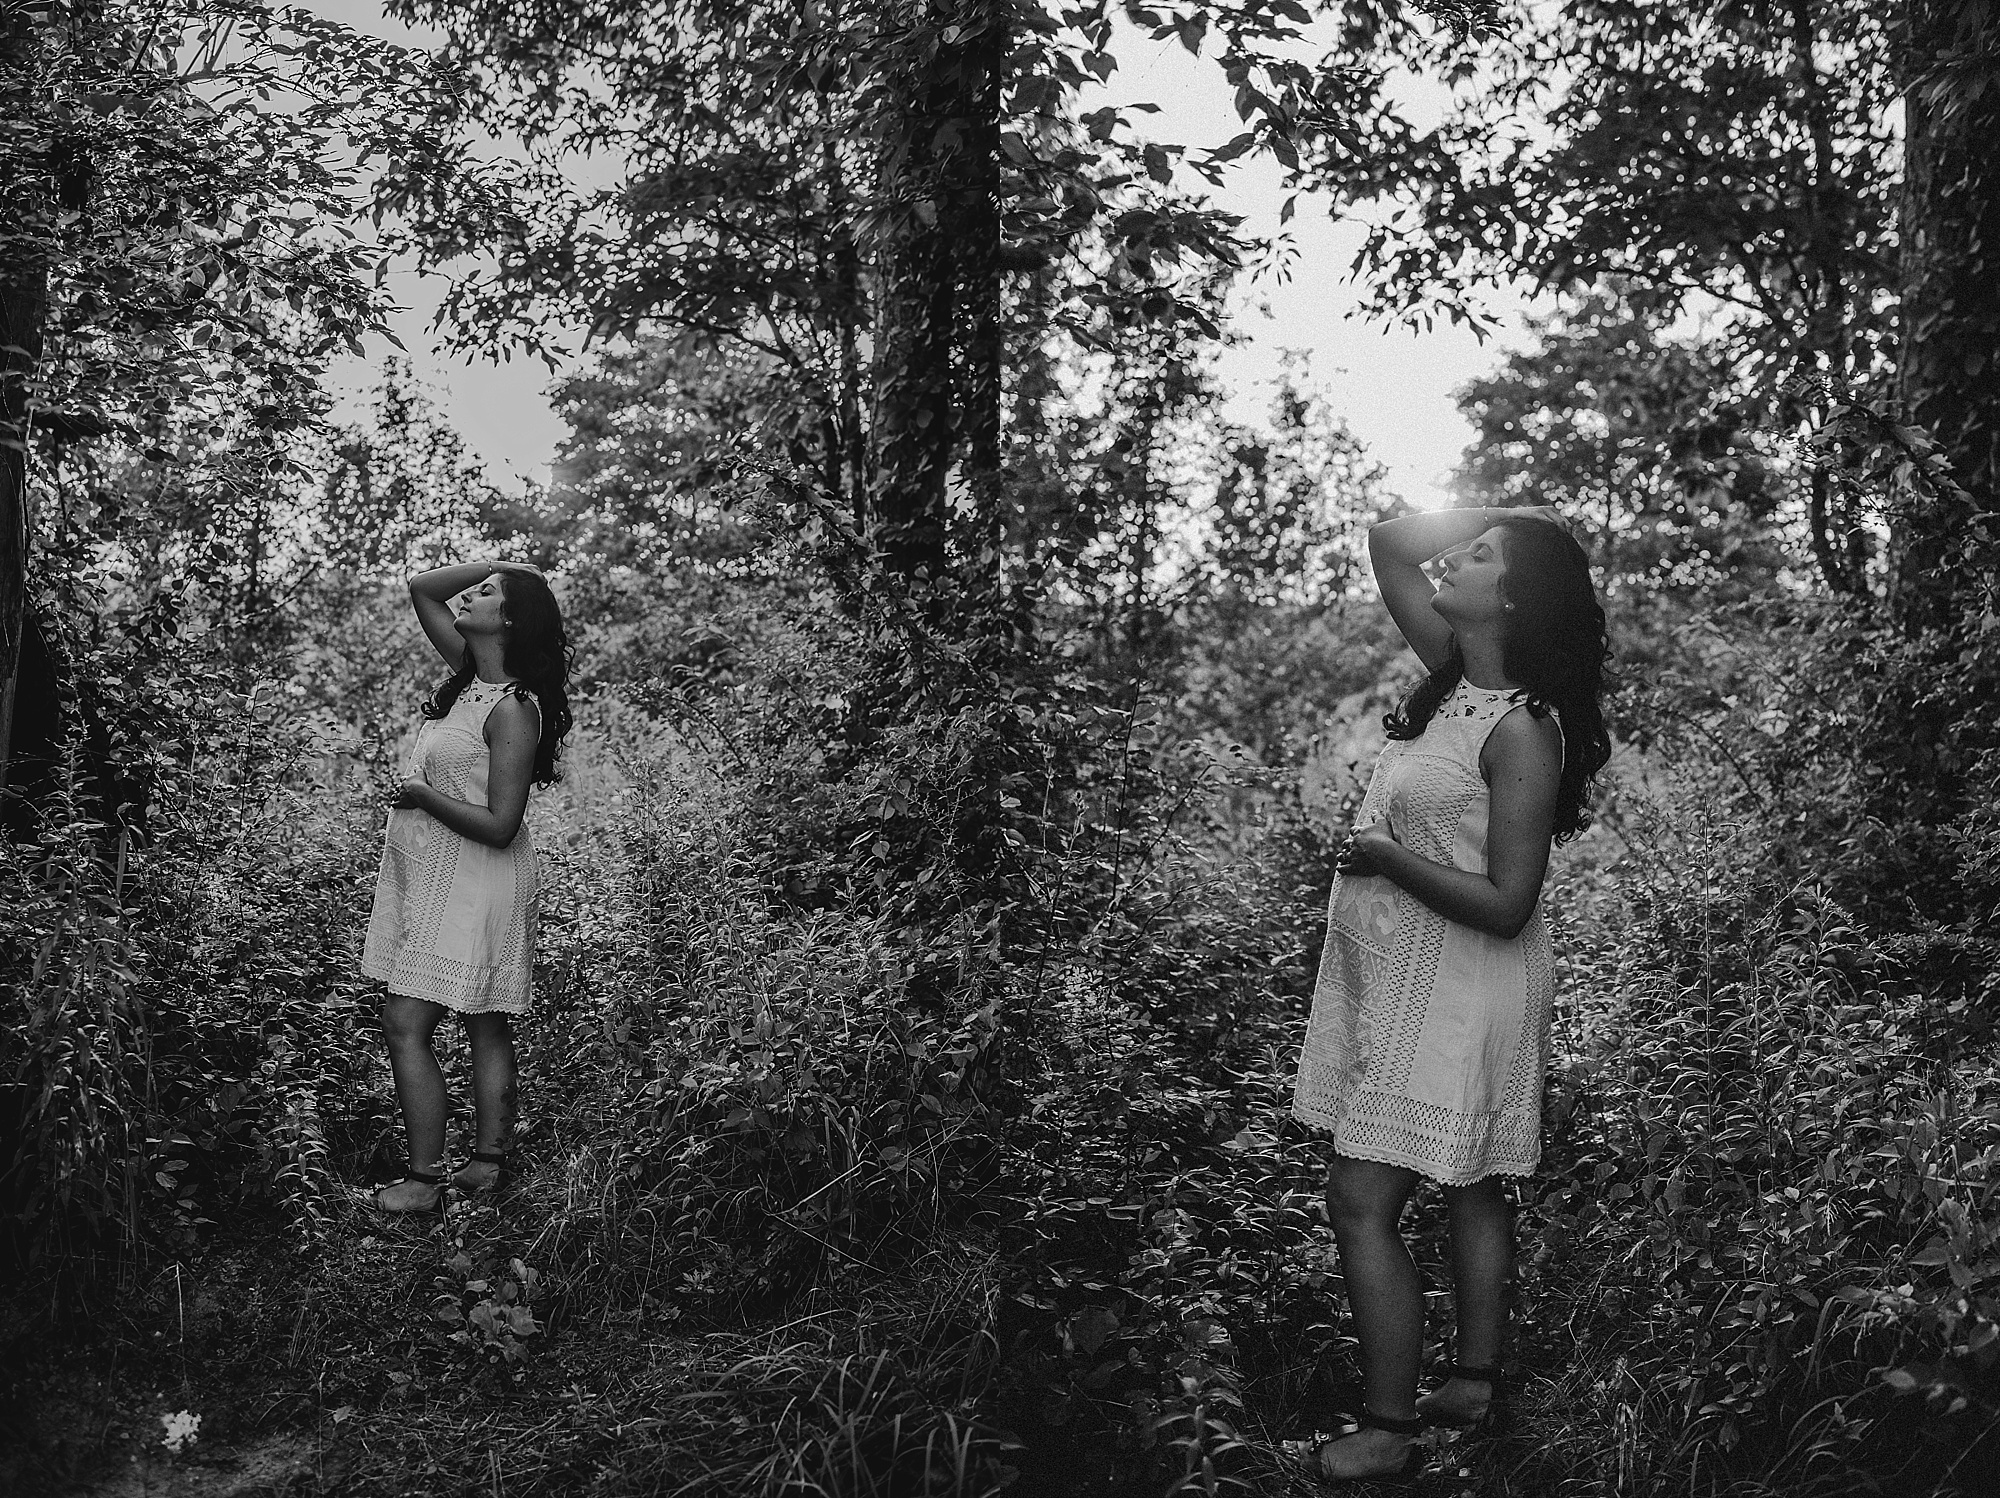 lauren-grayson-photography-cleveland-ohio-photographer-maternity-summer-outdoor-bohemian-fields-session_0505.jpg